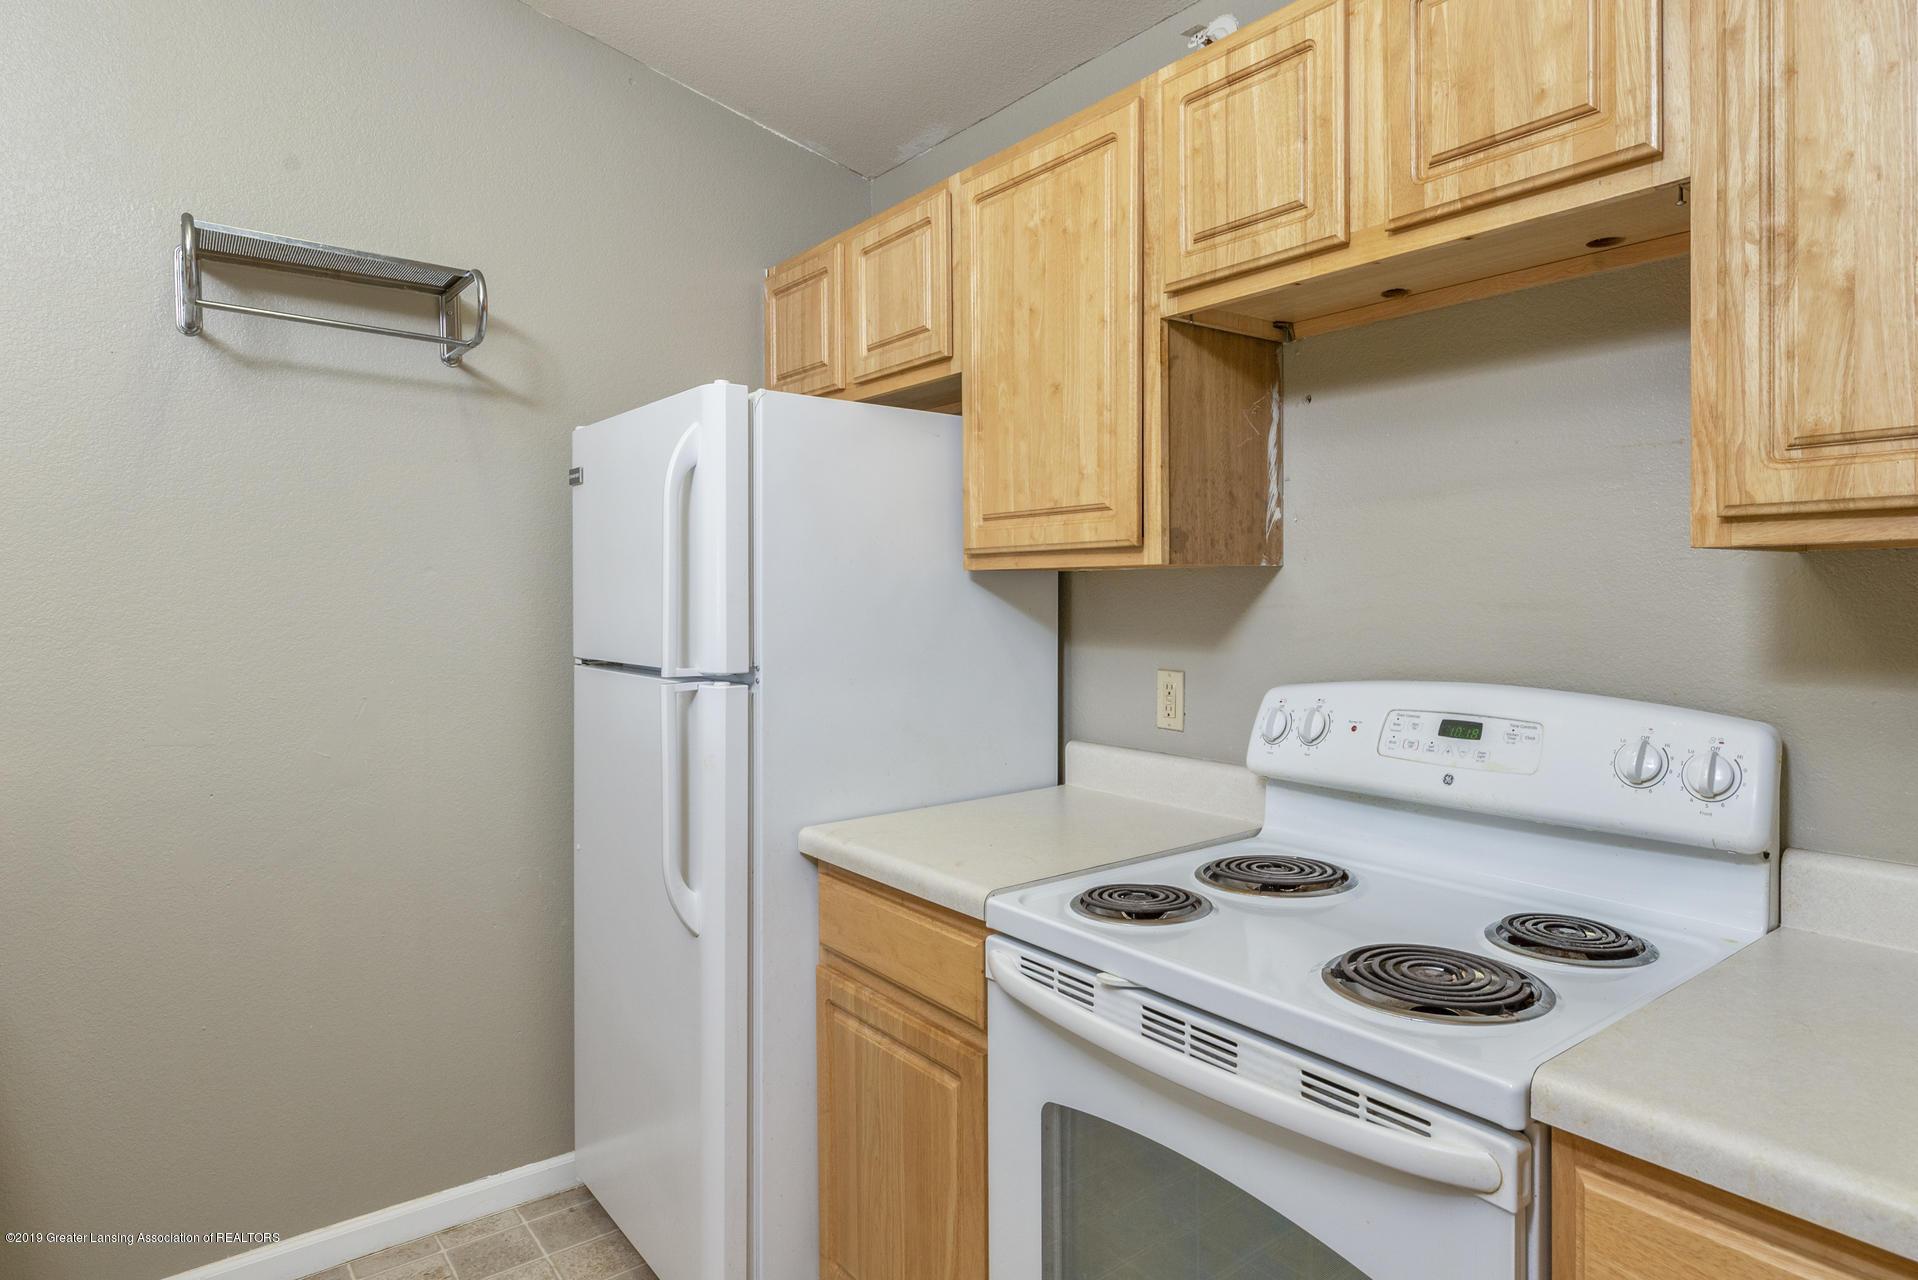 338 W Saginaw St UNIT 44 - 009-photo-kitchen-7483700 - 10